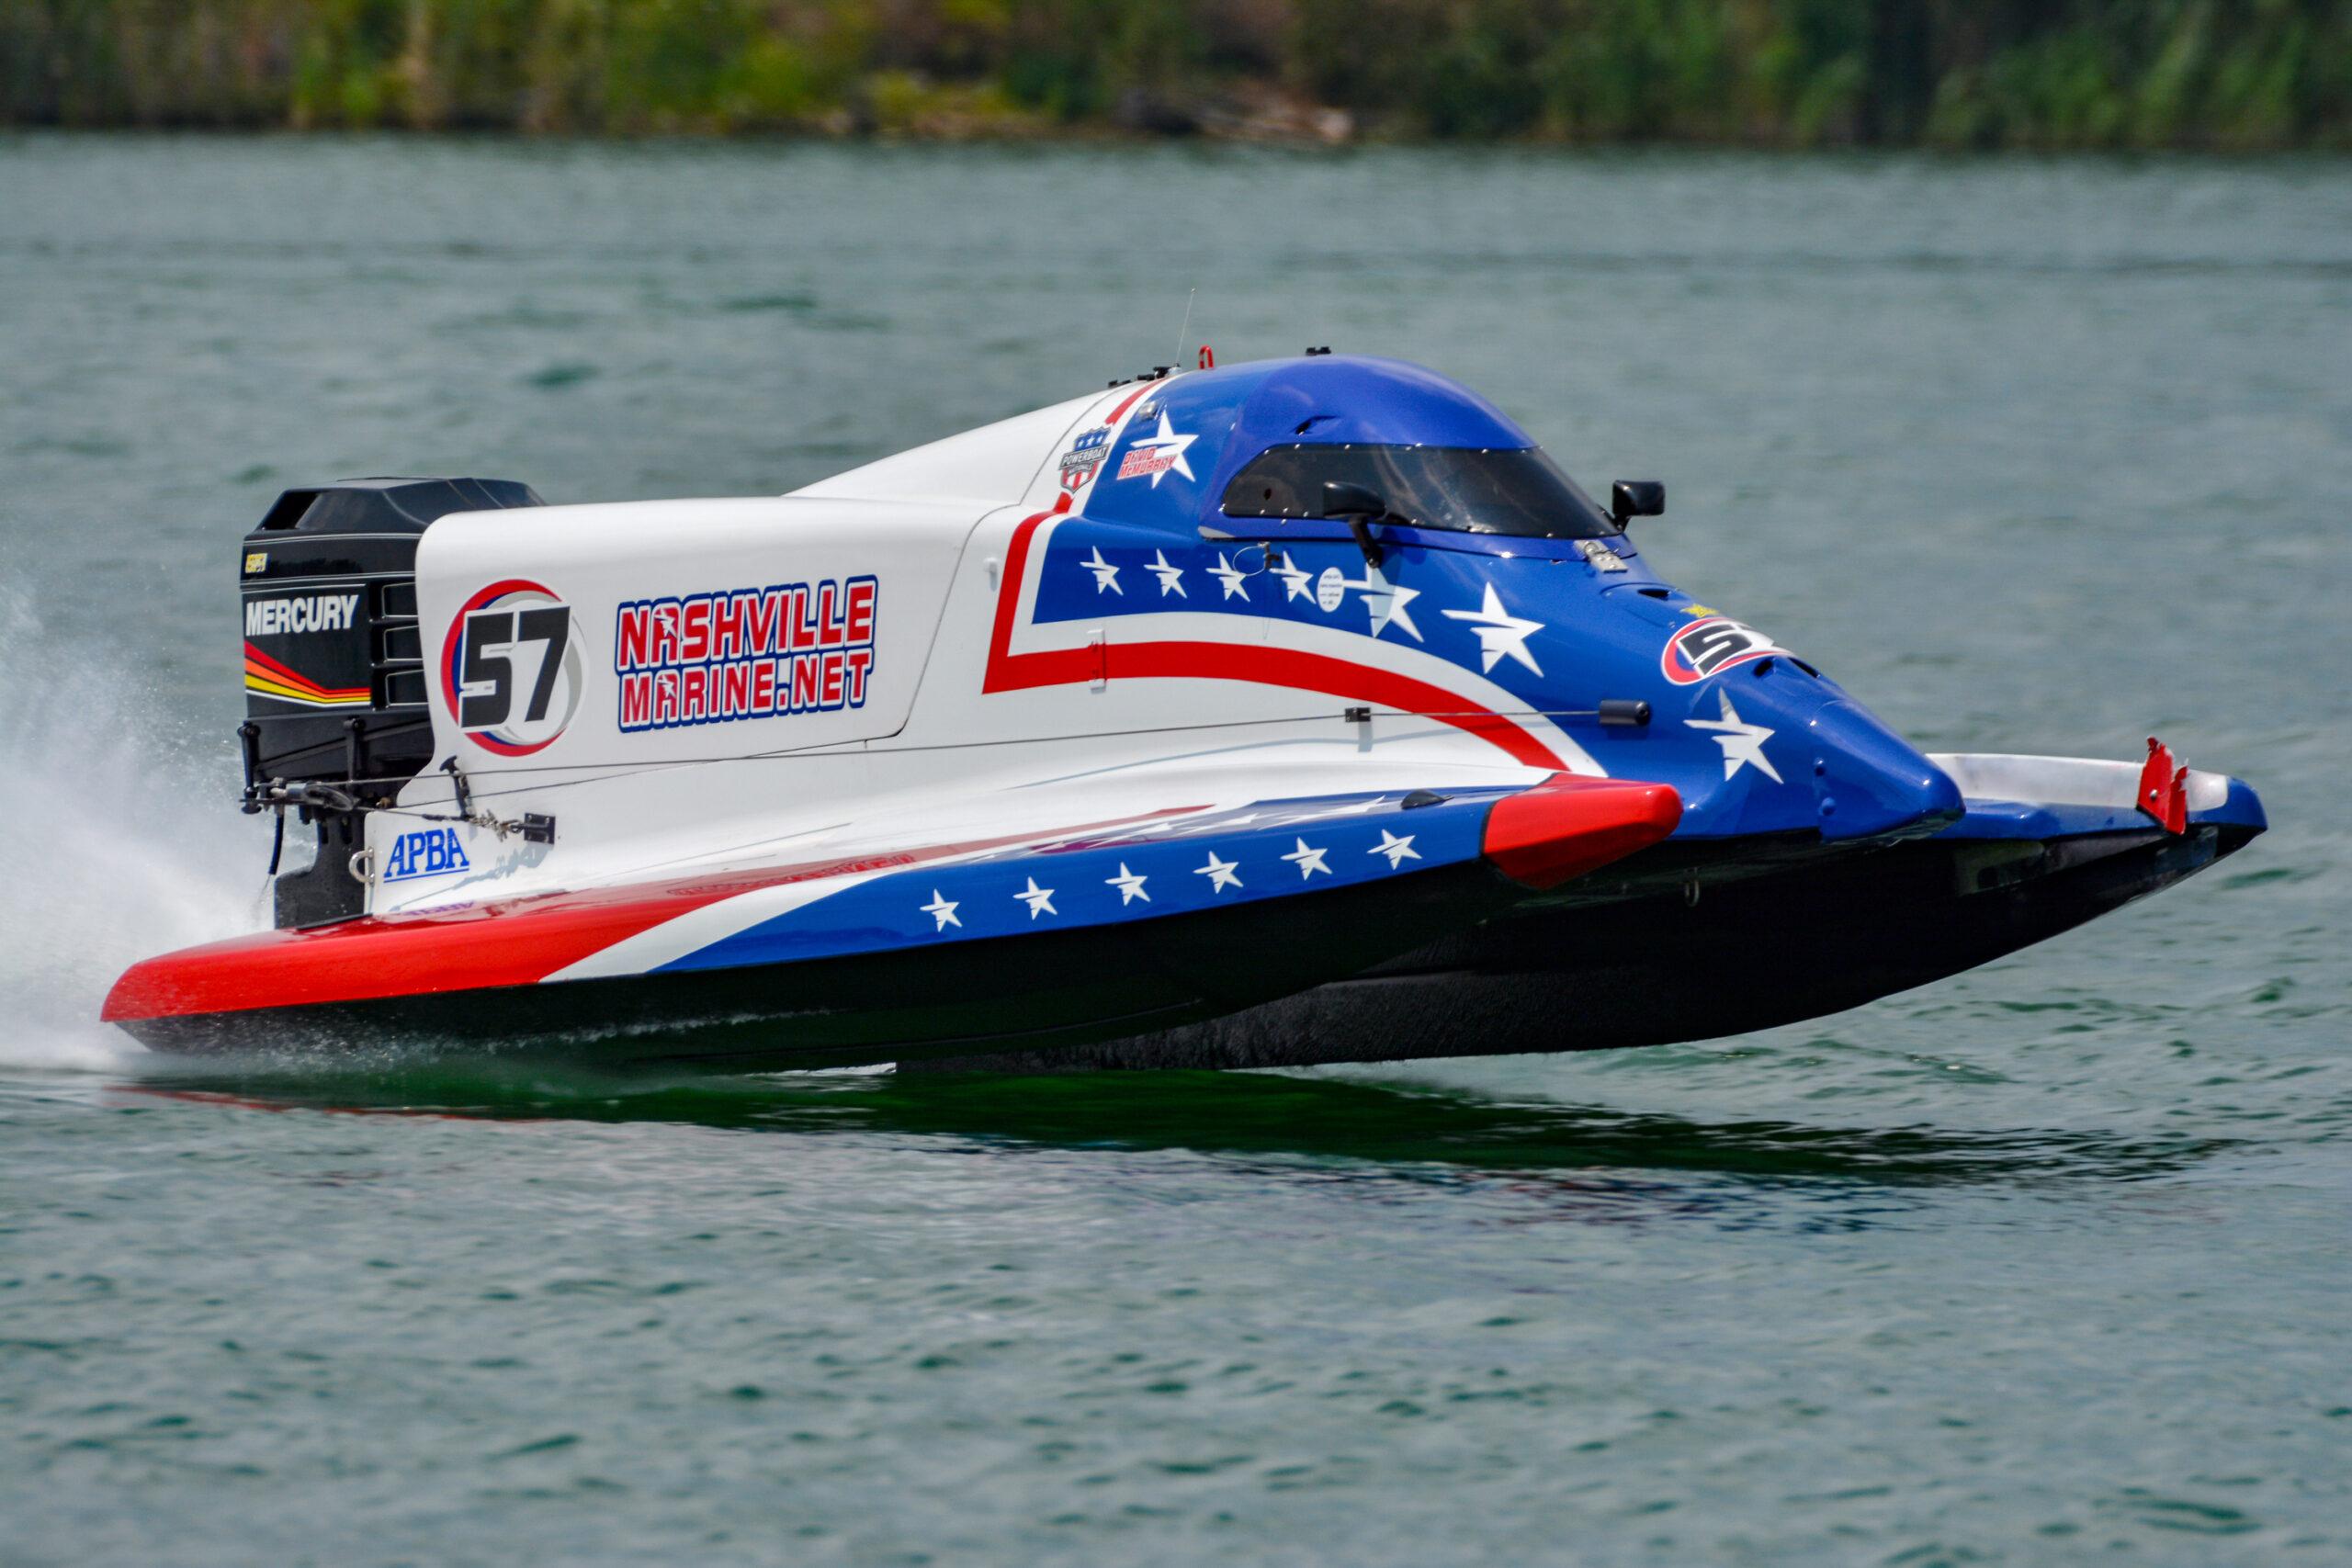 McMurray Racing Nashville Marine 2021 Springfield F1 Race-12